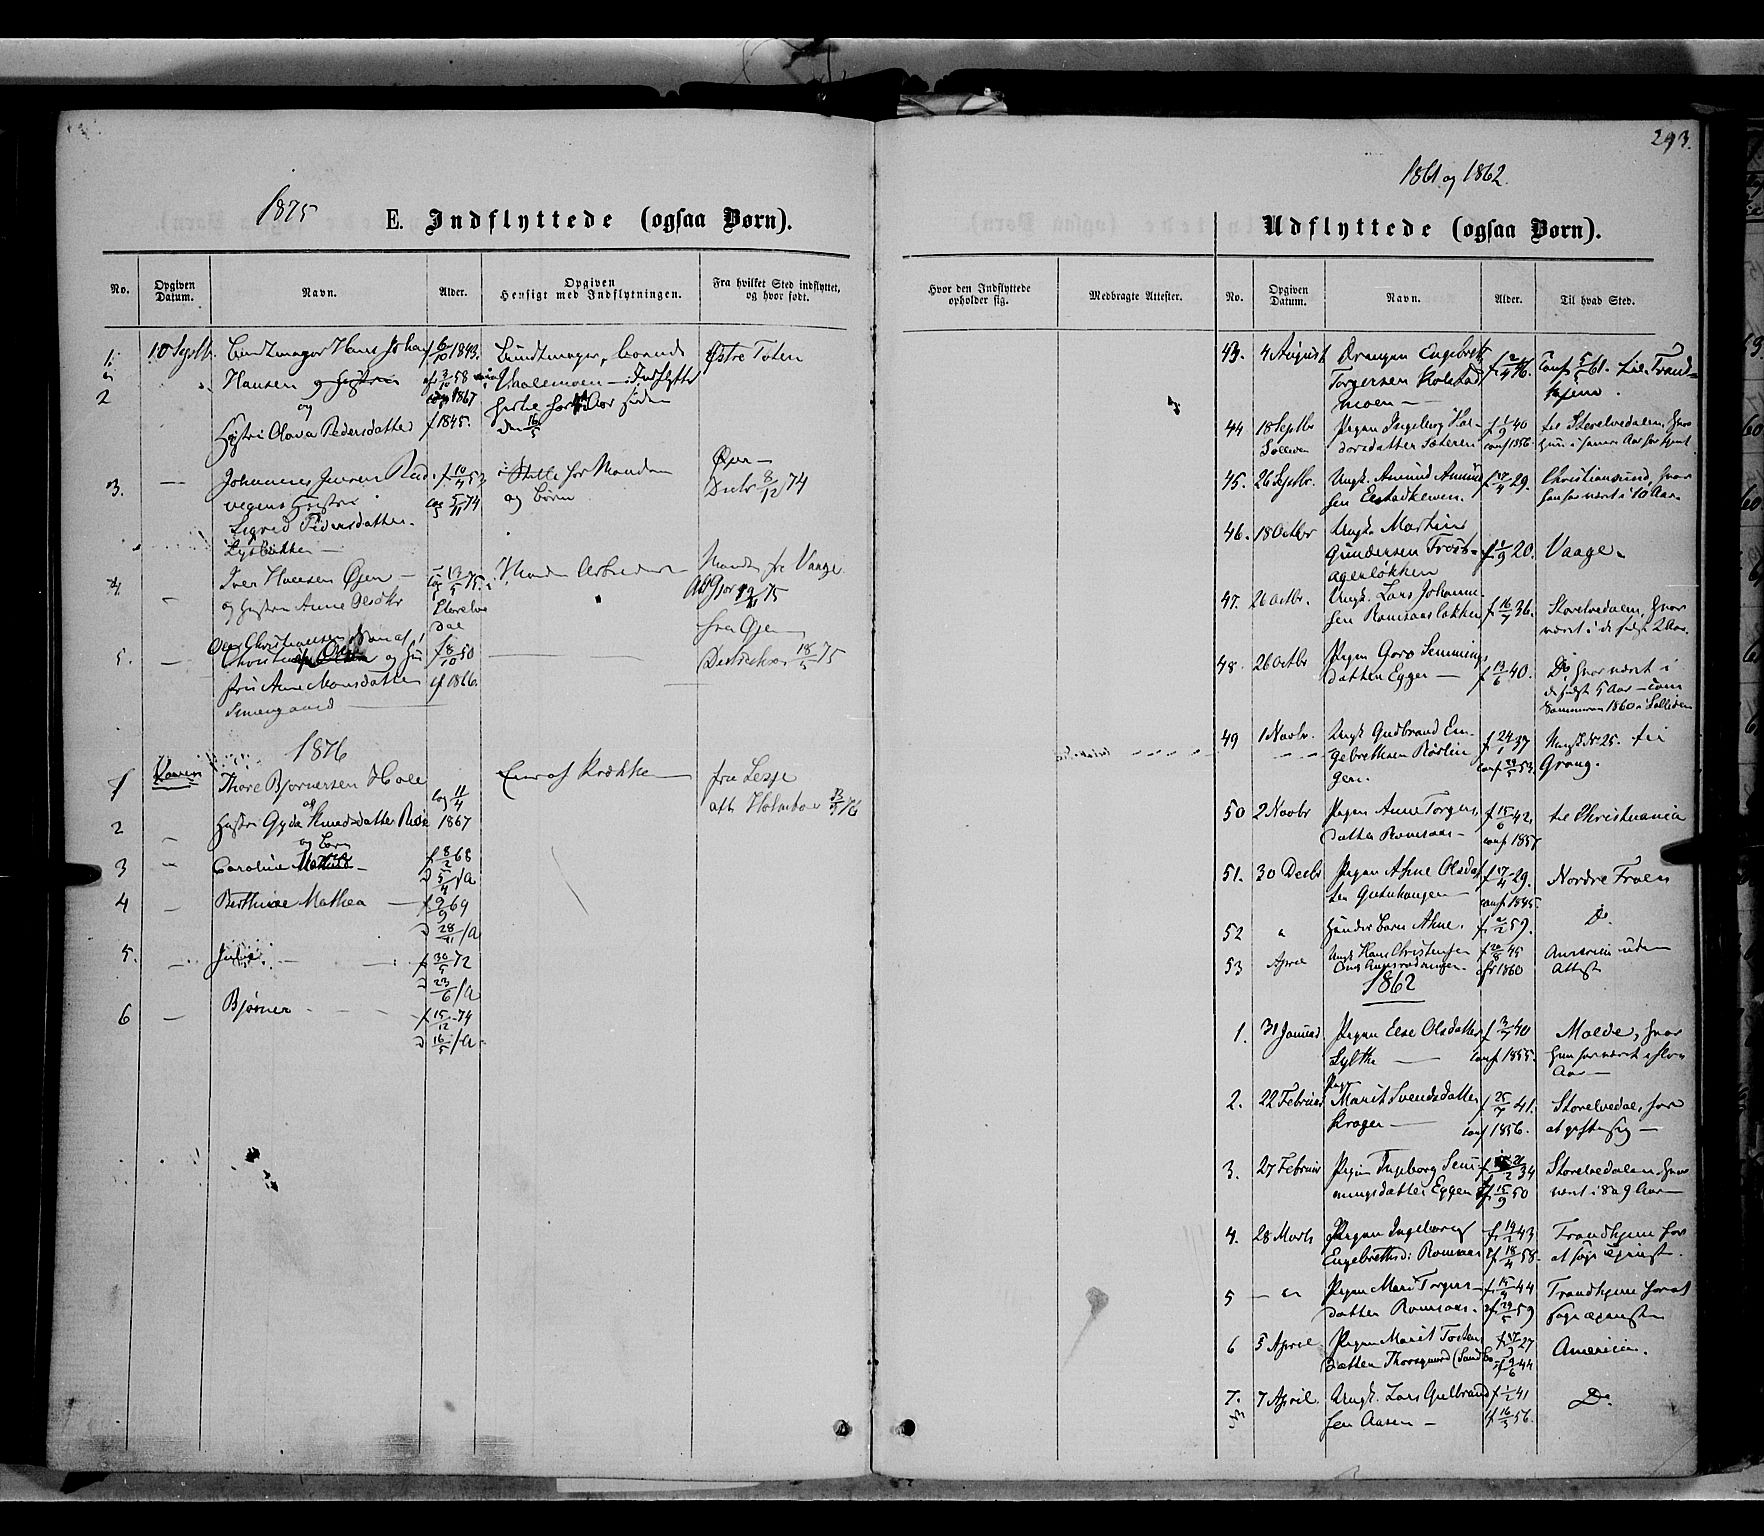 SAH, Ringebu prestekontor, Ministerialbok nr. 7, 1860-1877, s. 293